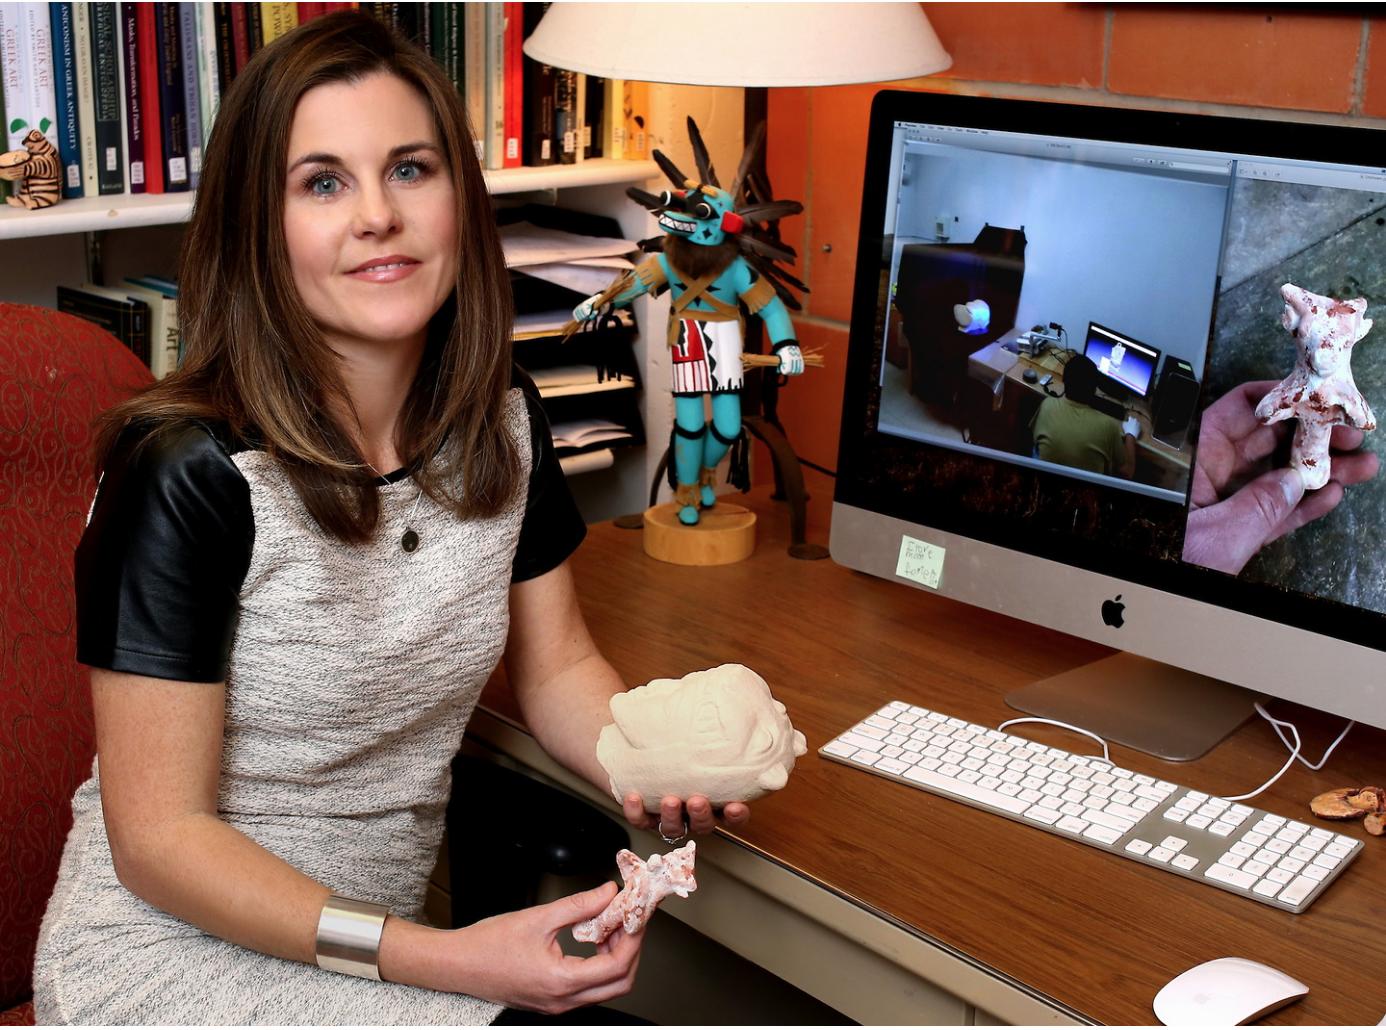 Dr. Erin Averett (Photo by Creighton University)